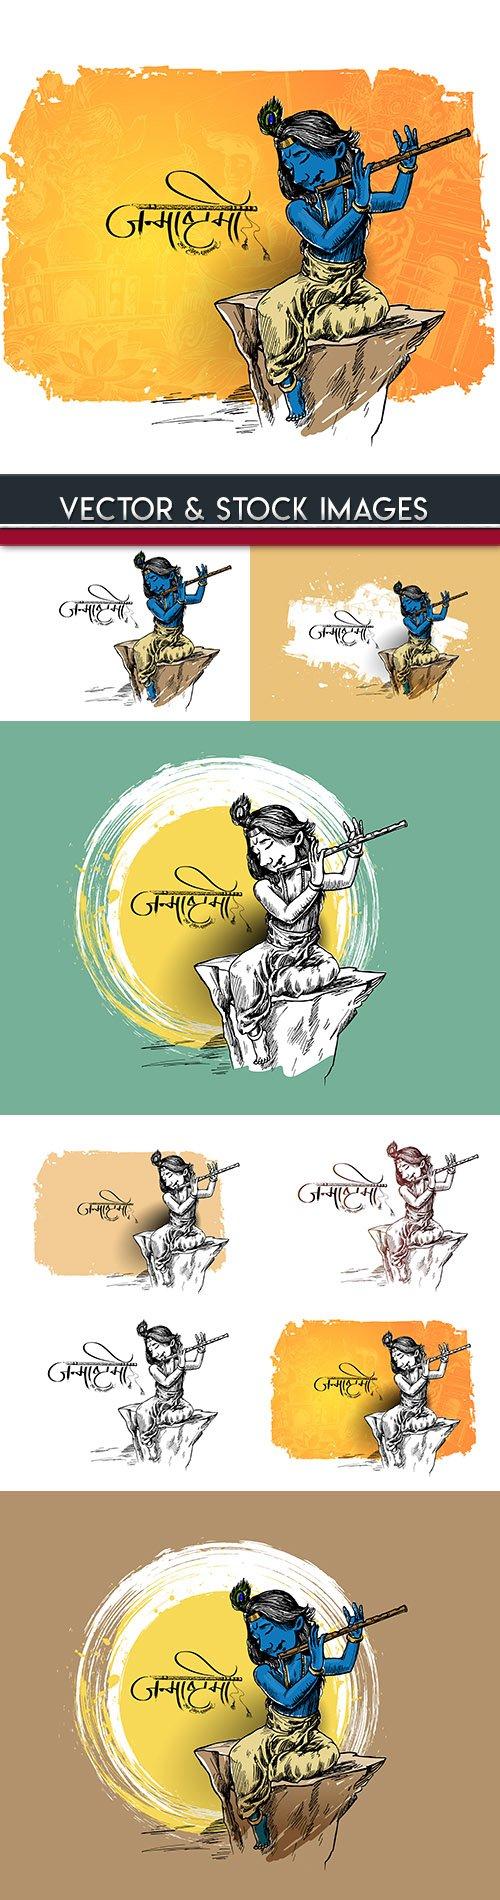 India culture happy holy deity festival illustration